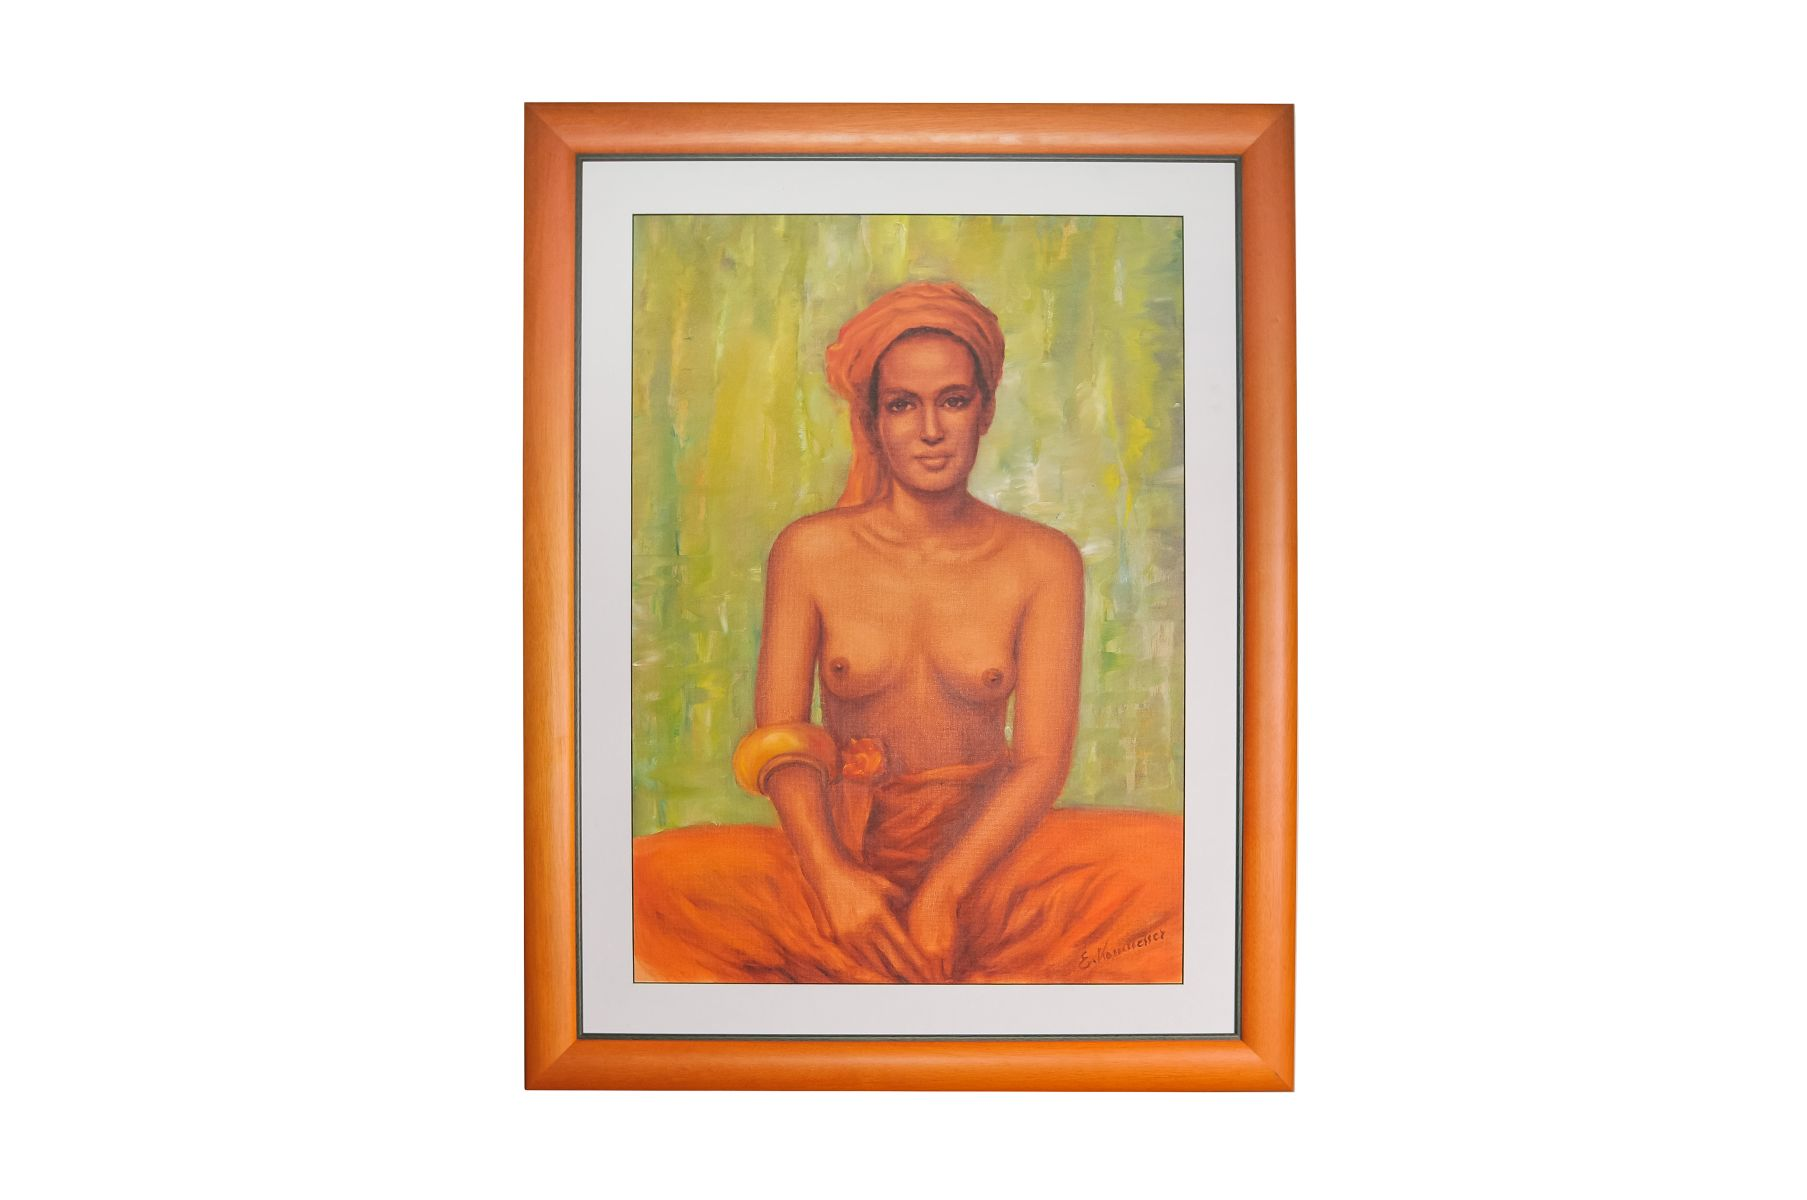 "#147 Erika Kornmesser (1934) ""Bedouin woman with a naked torso""   Erika Kornmesser (1934) ""Beduinenfrau mit nacktem Oberkörper"" Image"